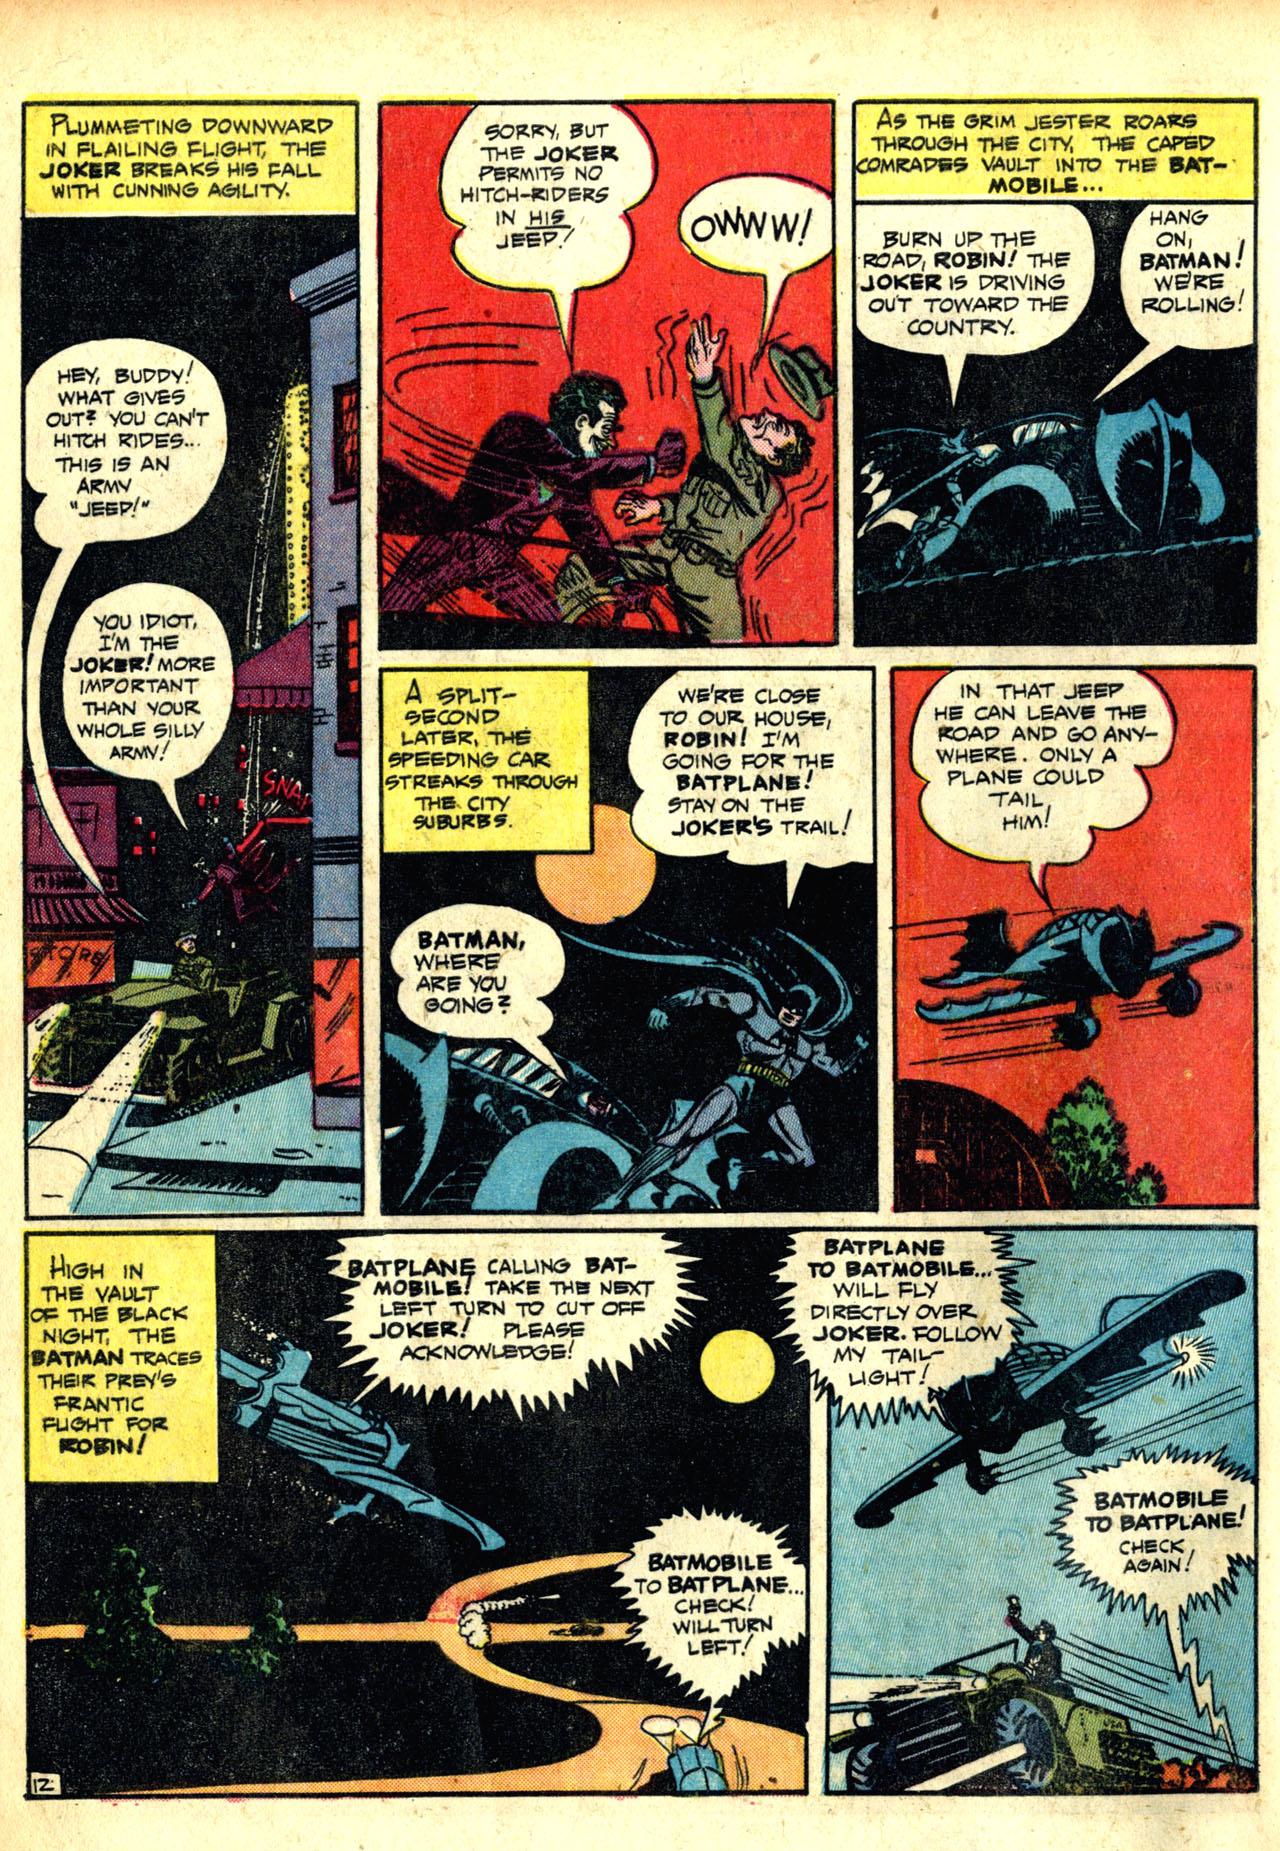 Detective Comics (1937) 64 Page 13